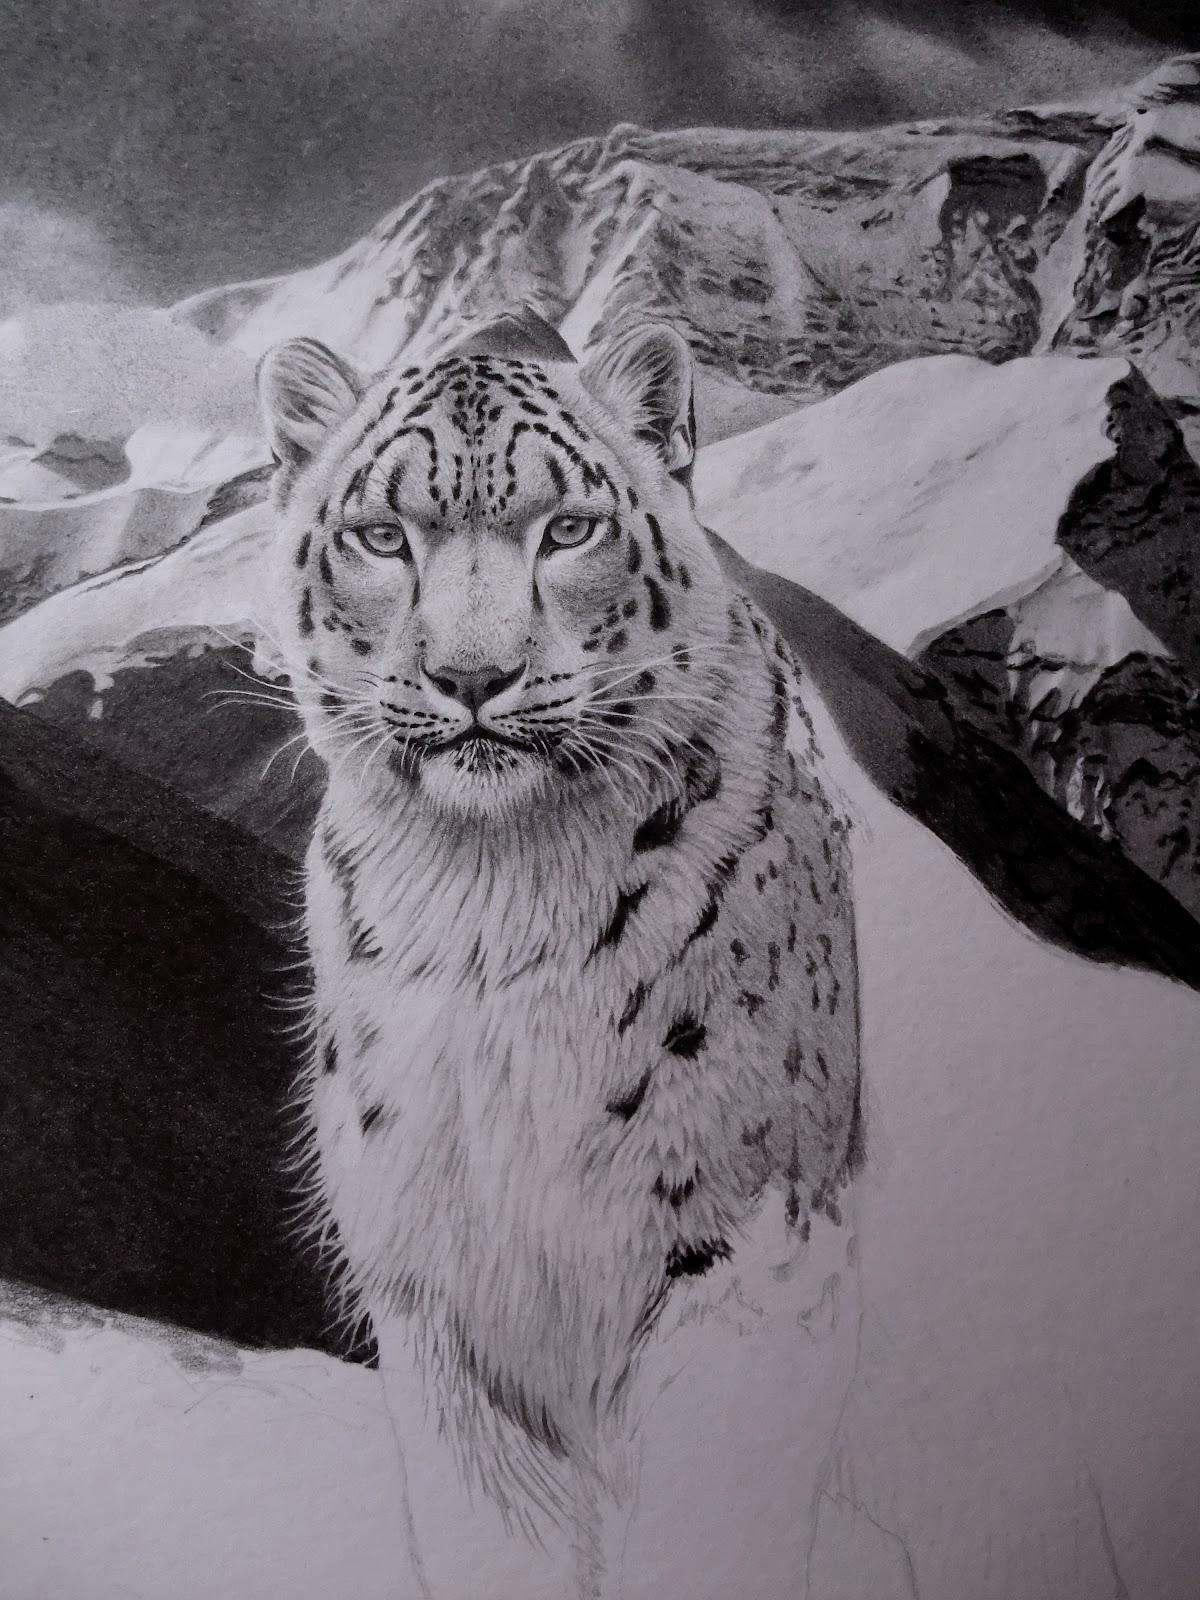 Antoine Roquain Dessin Animalier, Wildlife Pencil Art